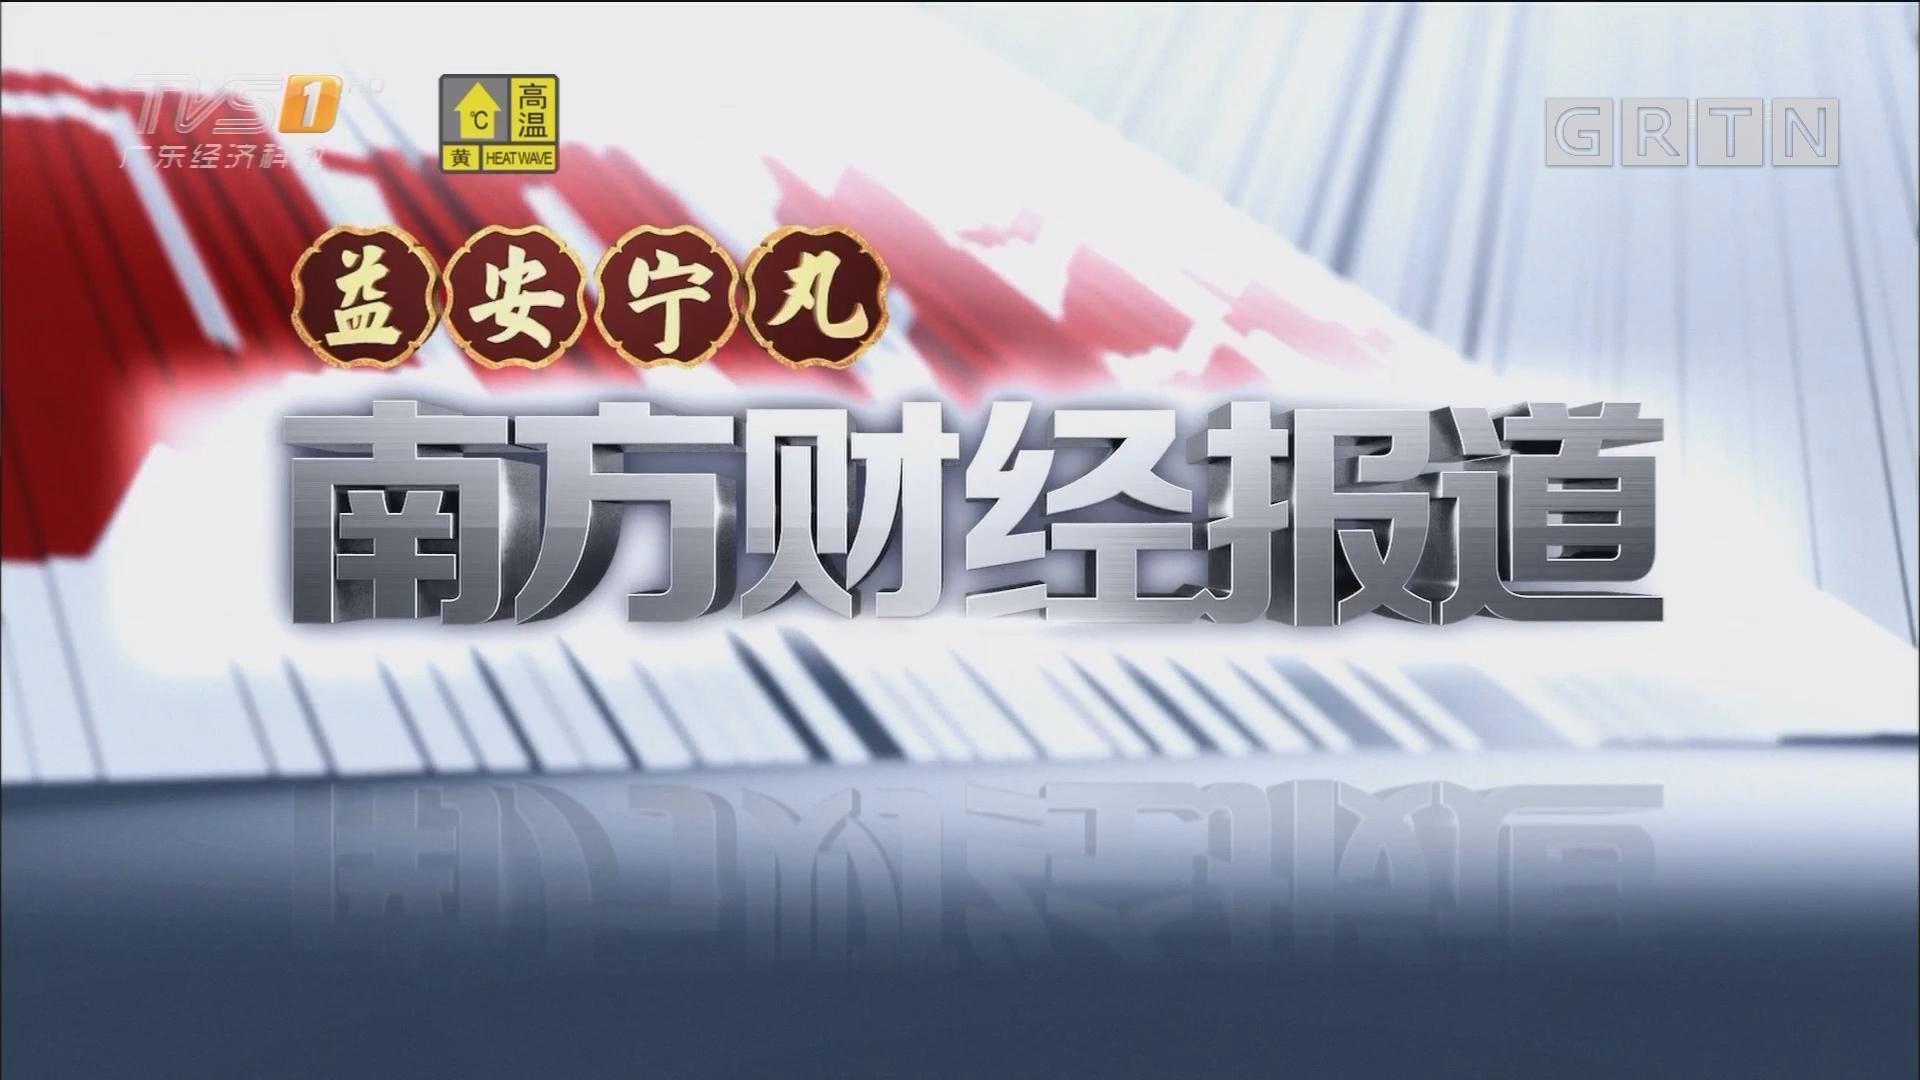 [HD][2017-08-13]南方财经报道:广州首套房贷利率上浮5% 突破基准利率